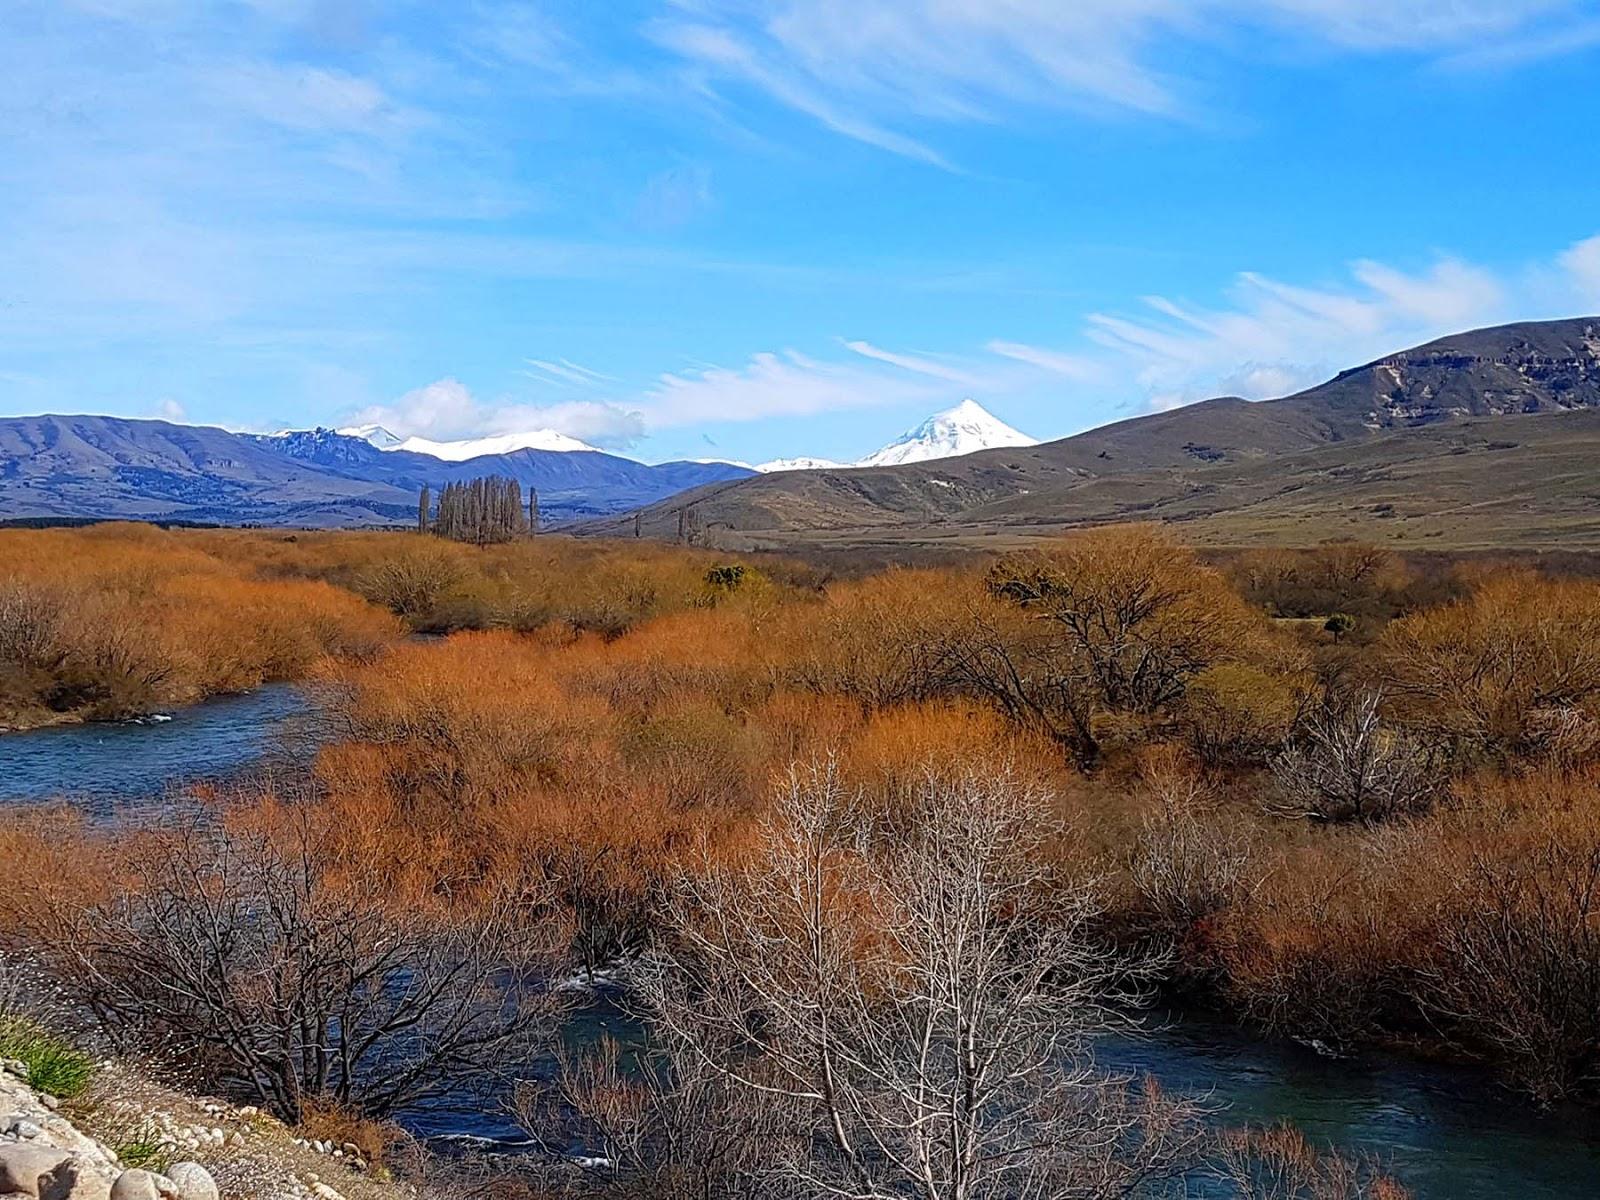 Roteiro Bariloche, Villa Angostura, San Martin de los Andes em 9 dias